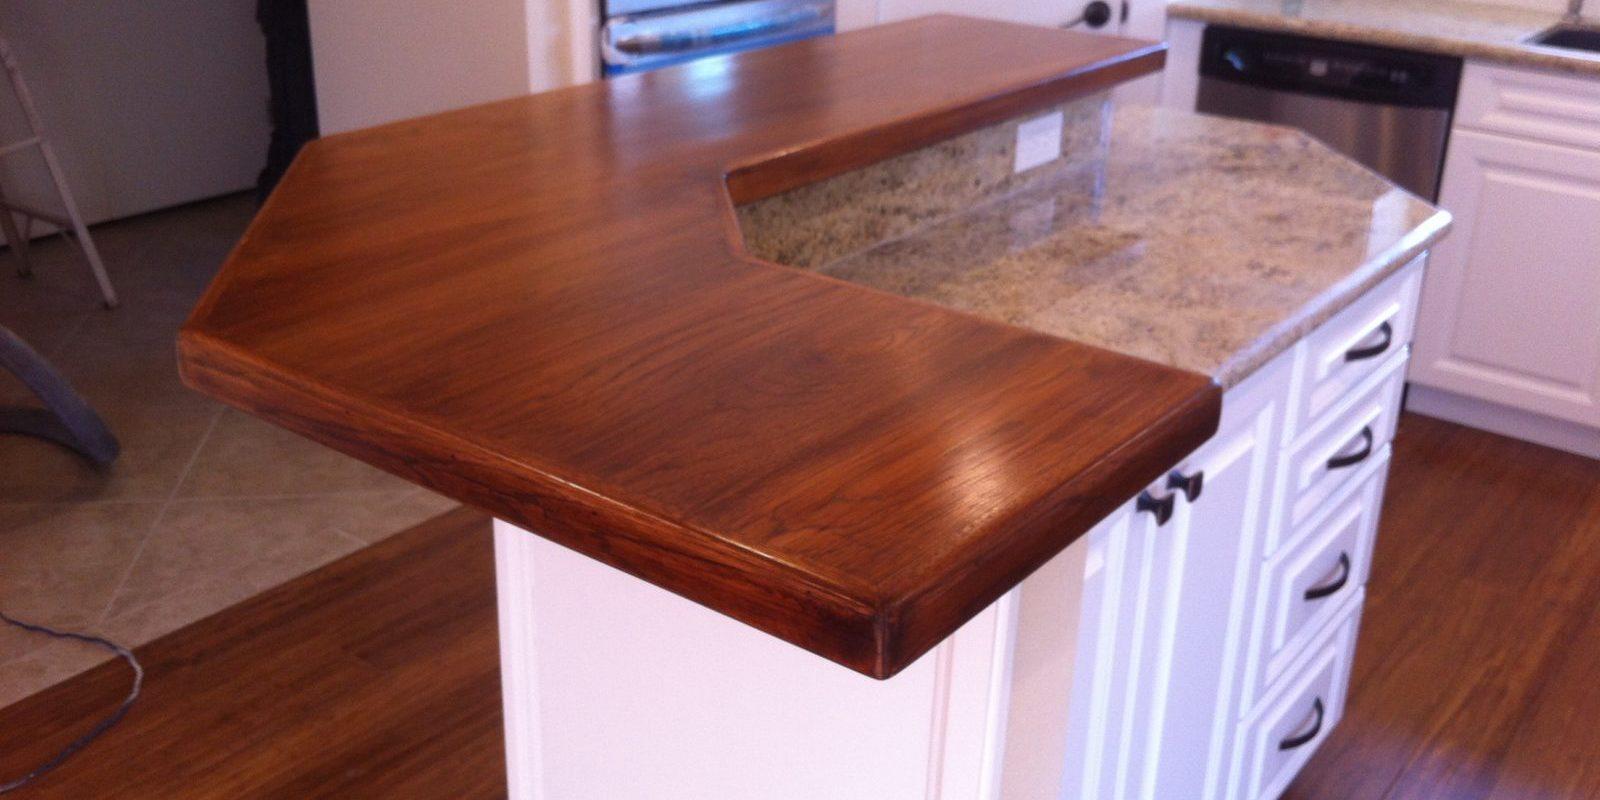 Wood Countertop For Tierrasanta Kitchen Remodel San Diego Custom Building Remodeling J